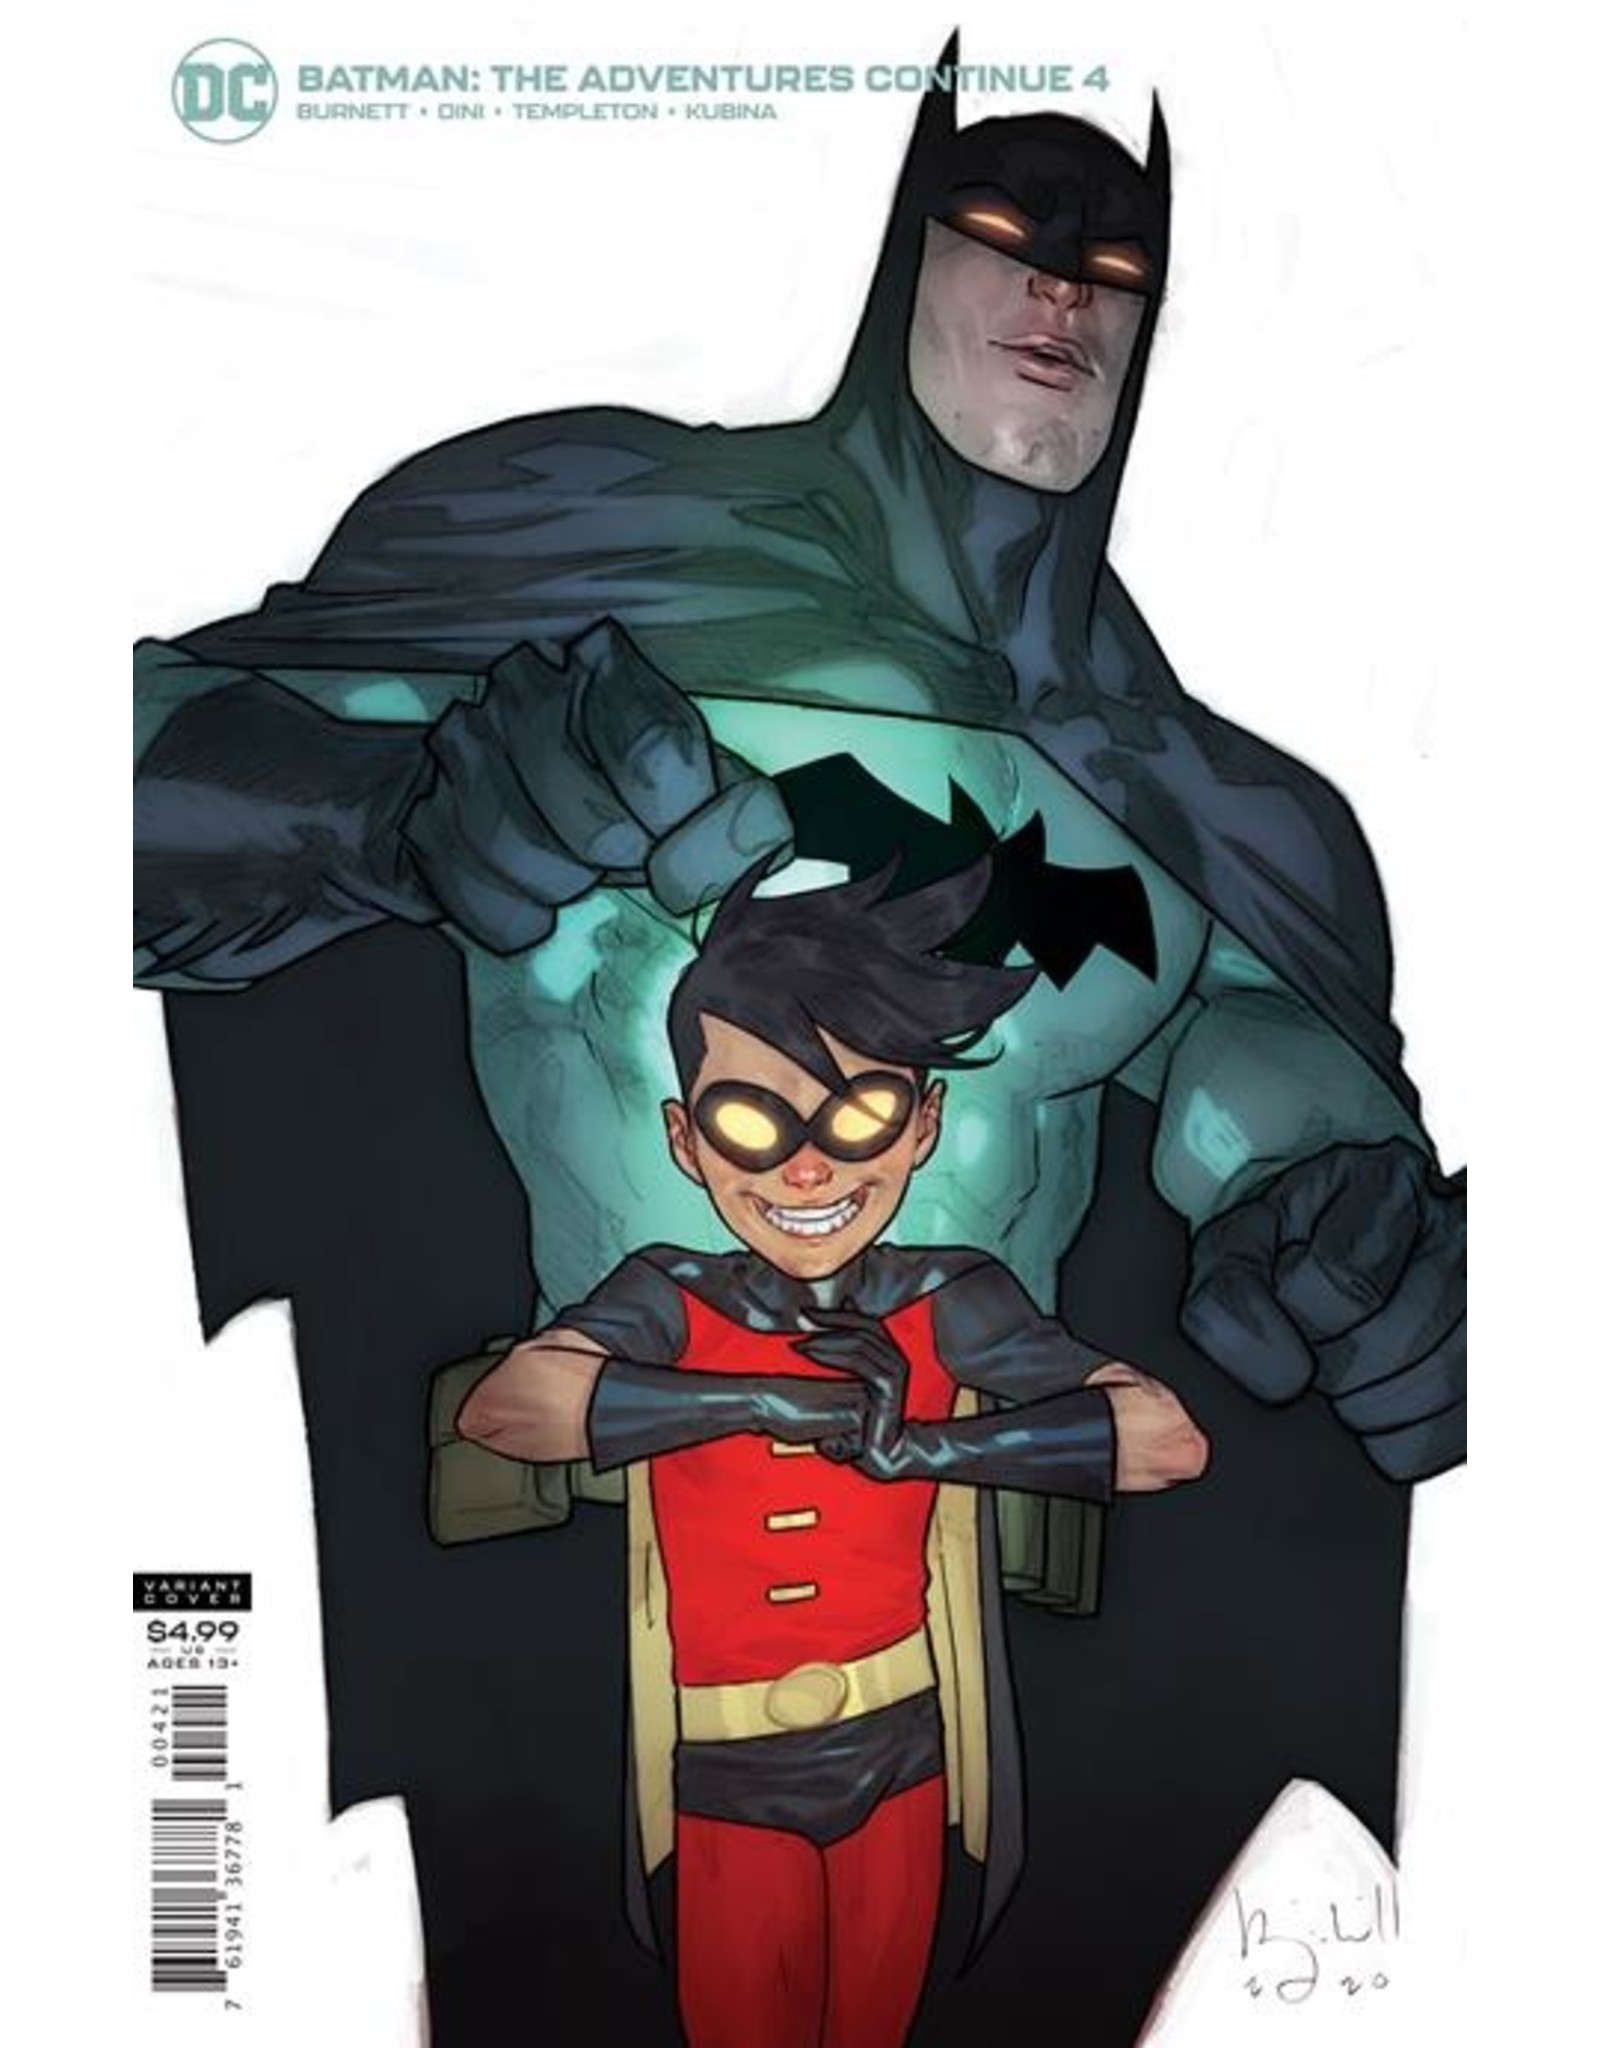 DC COMICS BATMAN THE ADVENTURES CONTINUE #4 (OF 7) CVR B BEN CALDWELL CARD STOCK VAR